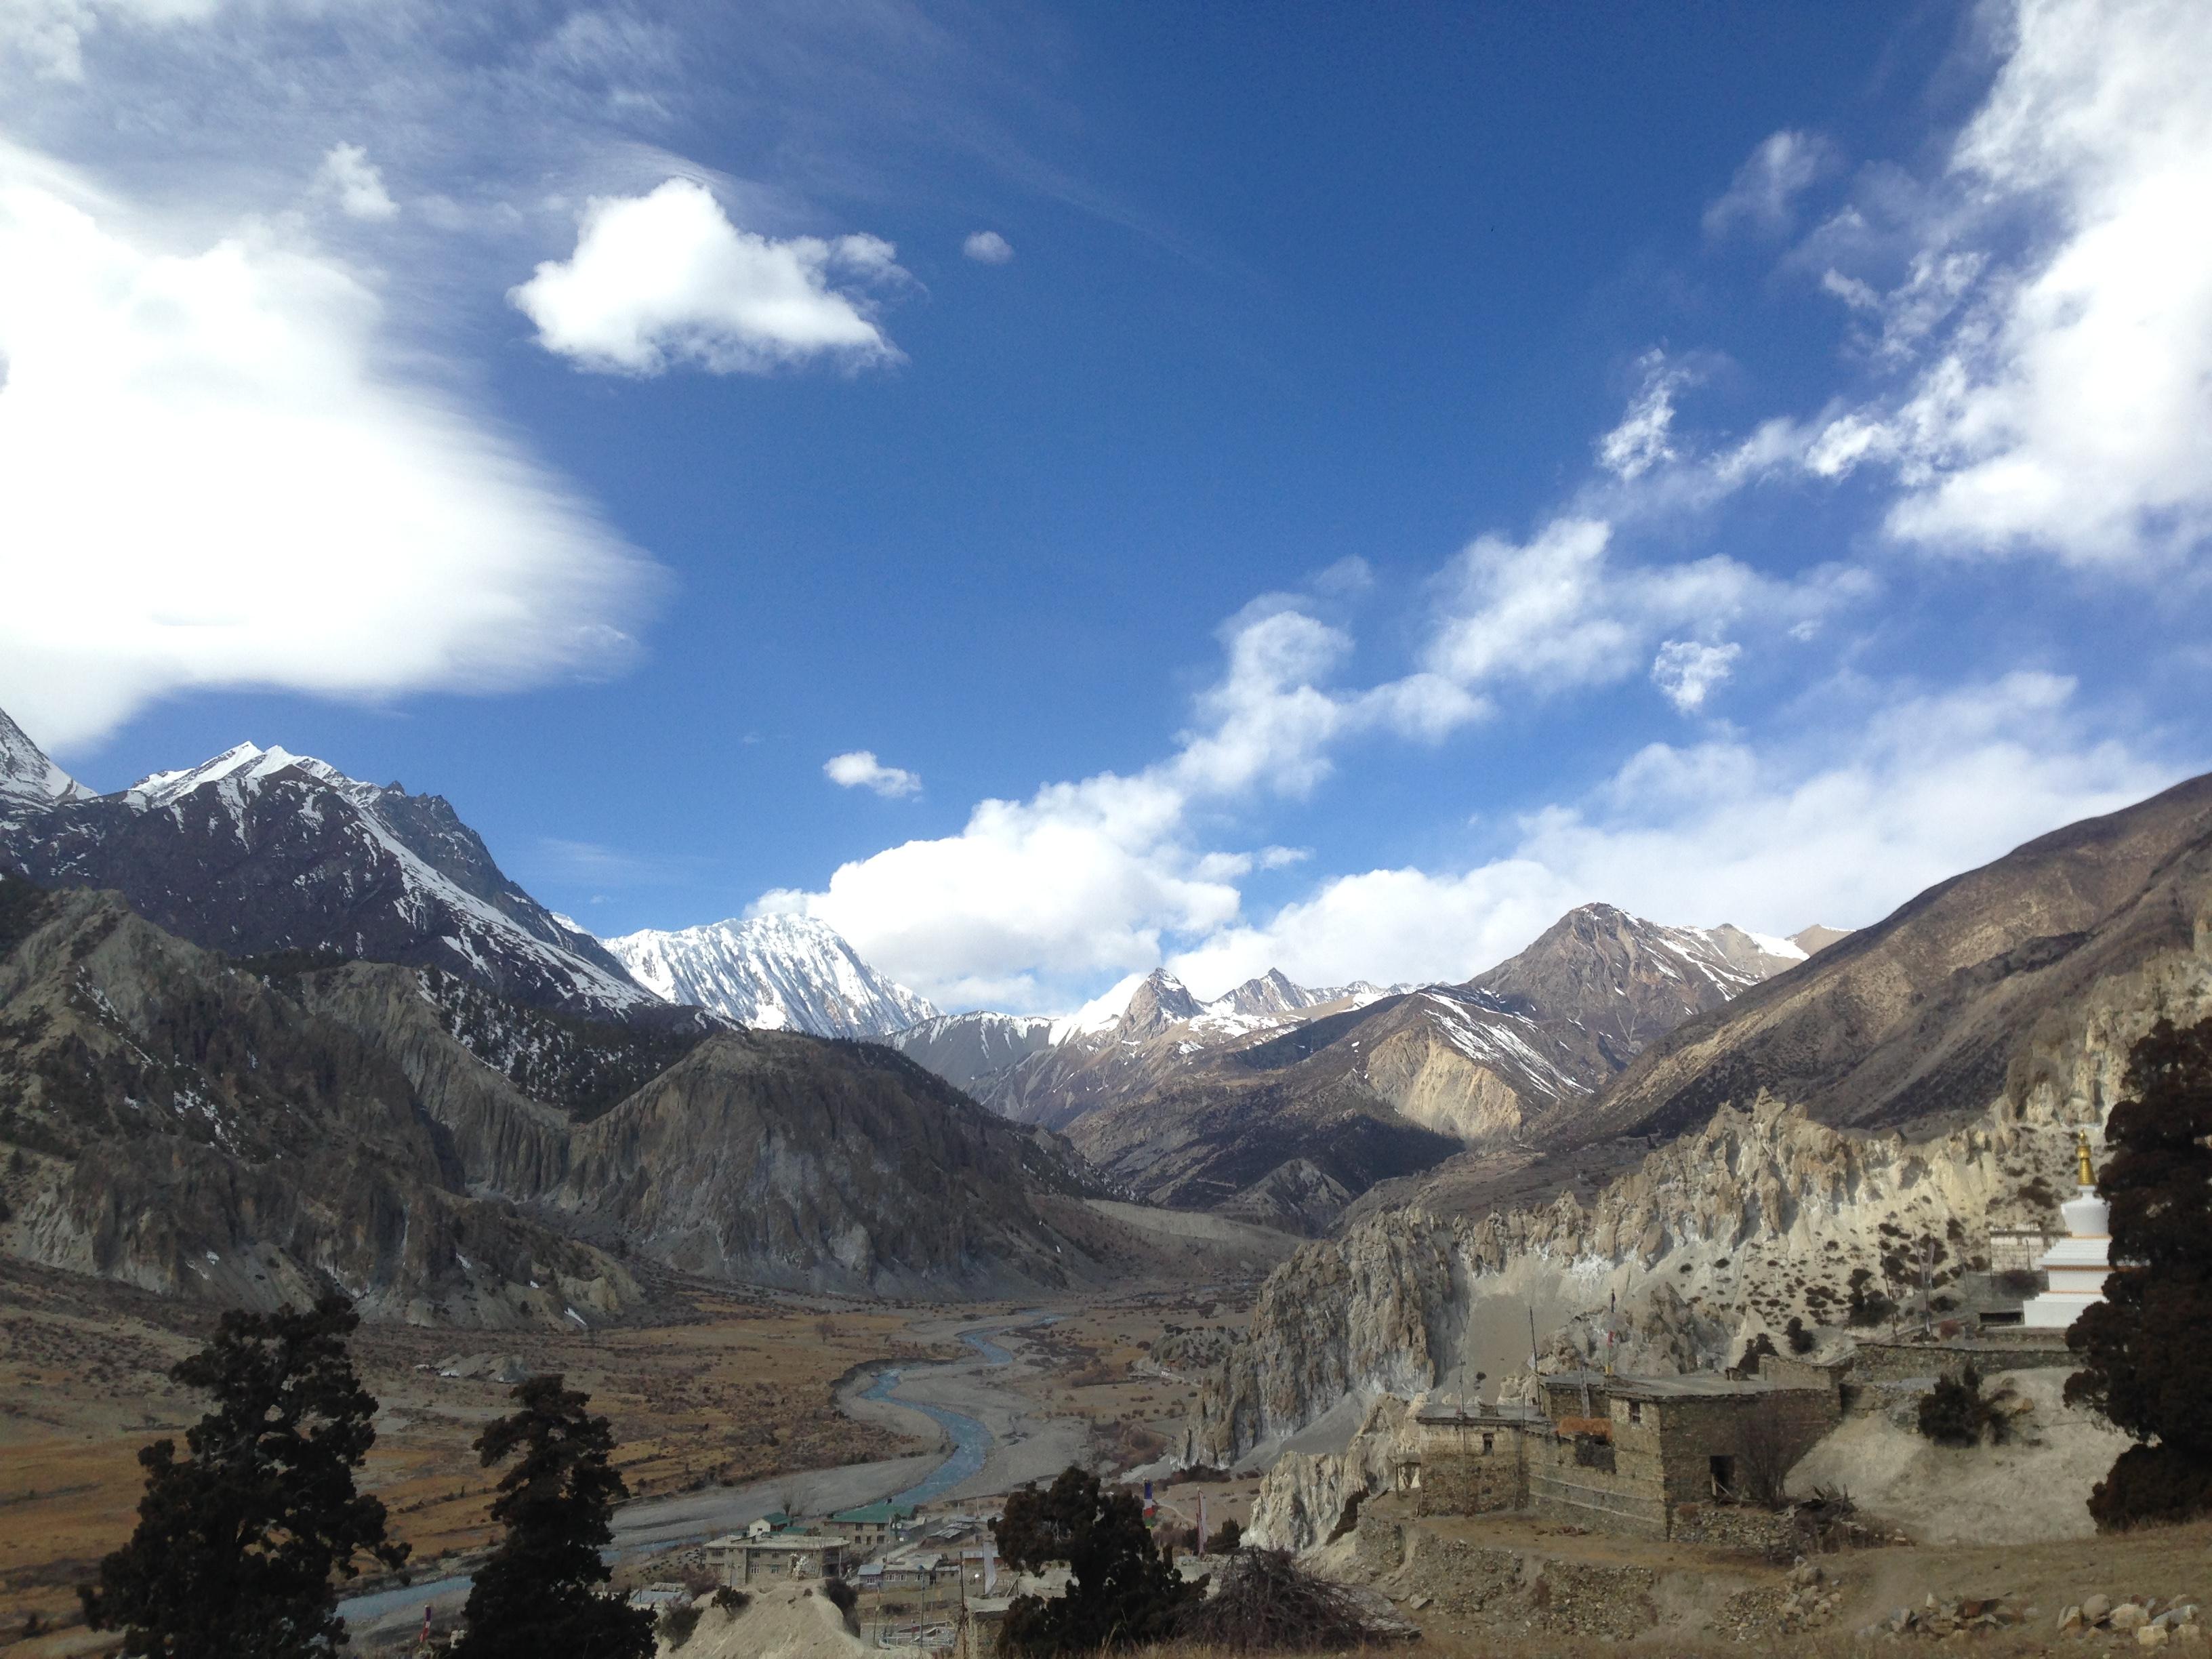 Circuito del Annapurna por etapas